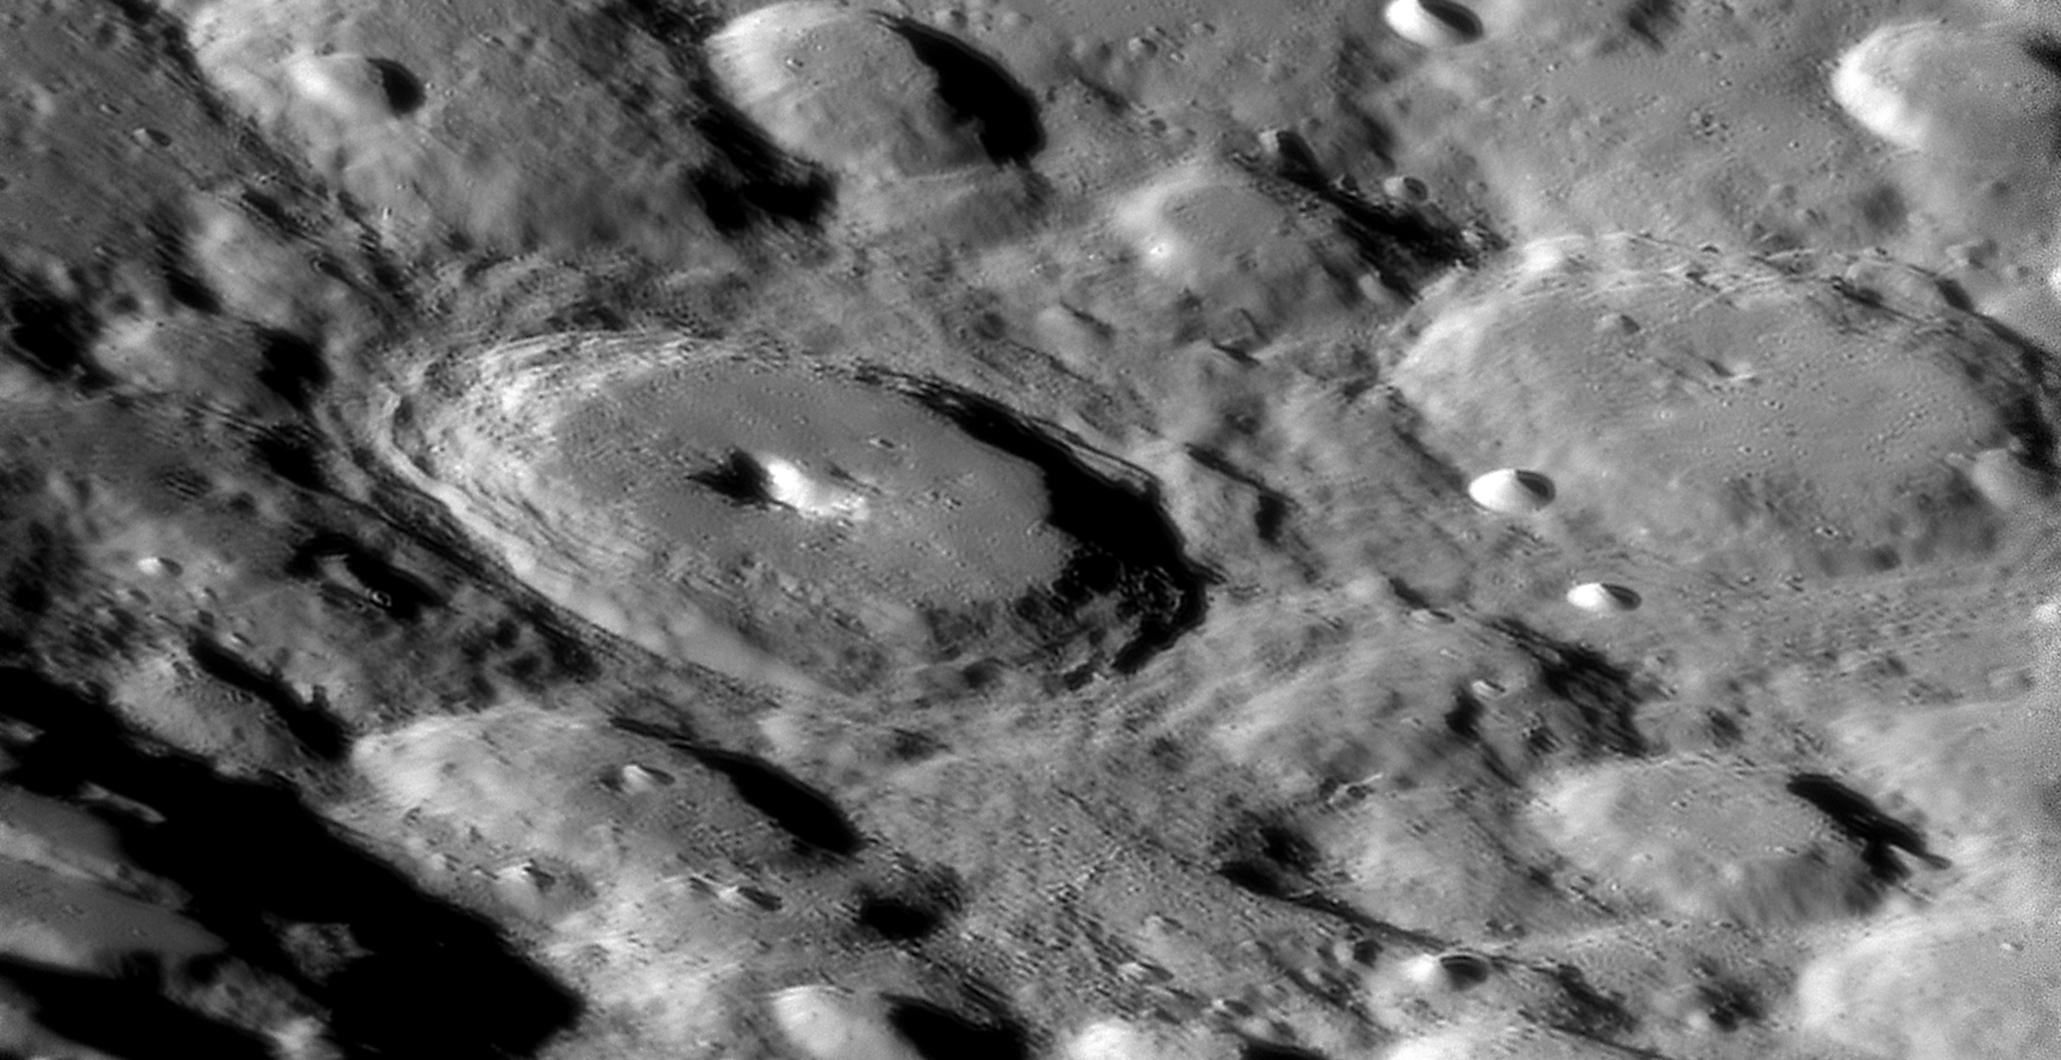 large.moon_03_04_2020_CAS_MORETUS.jpg.00f061554a4c7fb72b26bb26b26f4c14.jpg